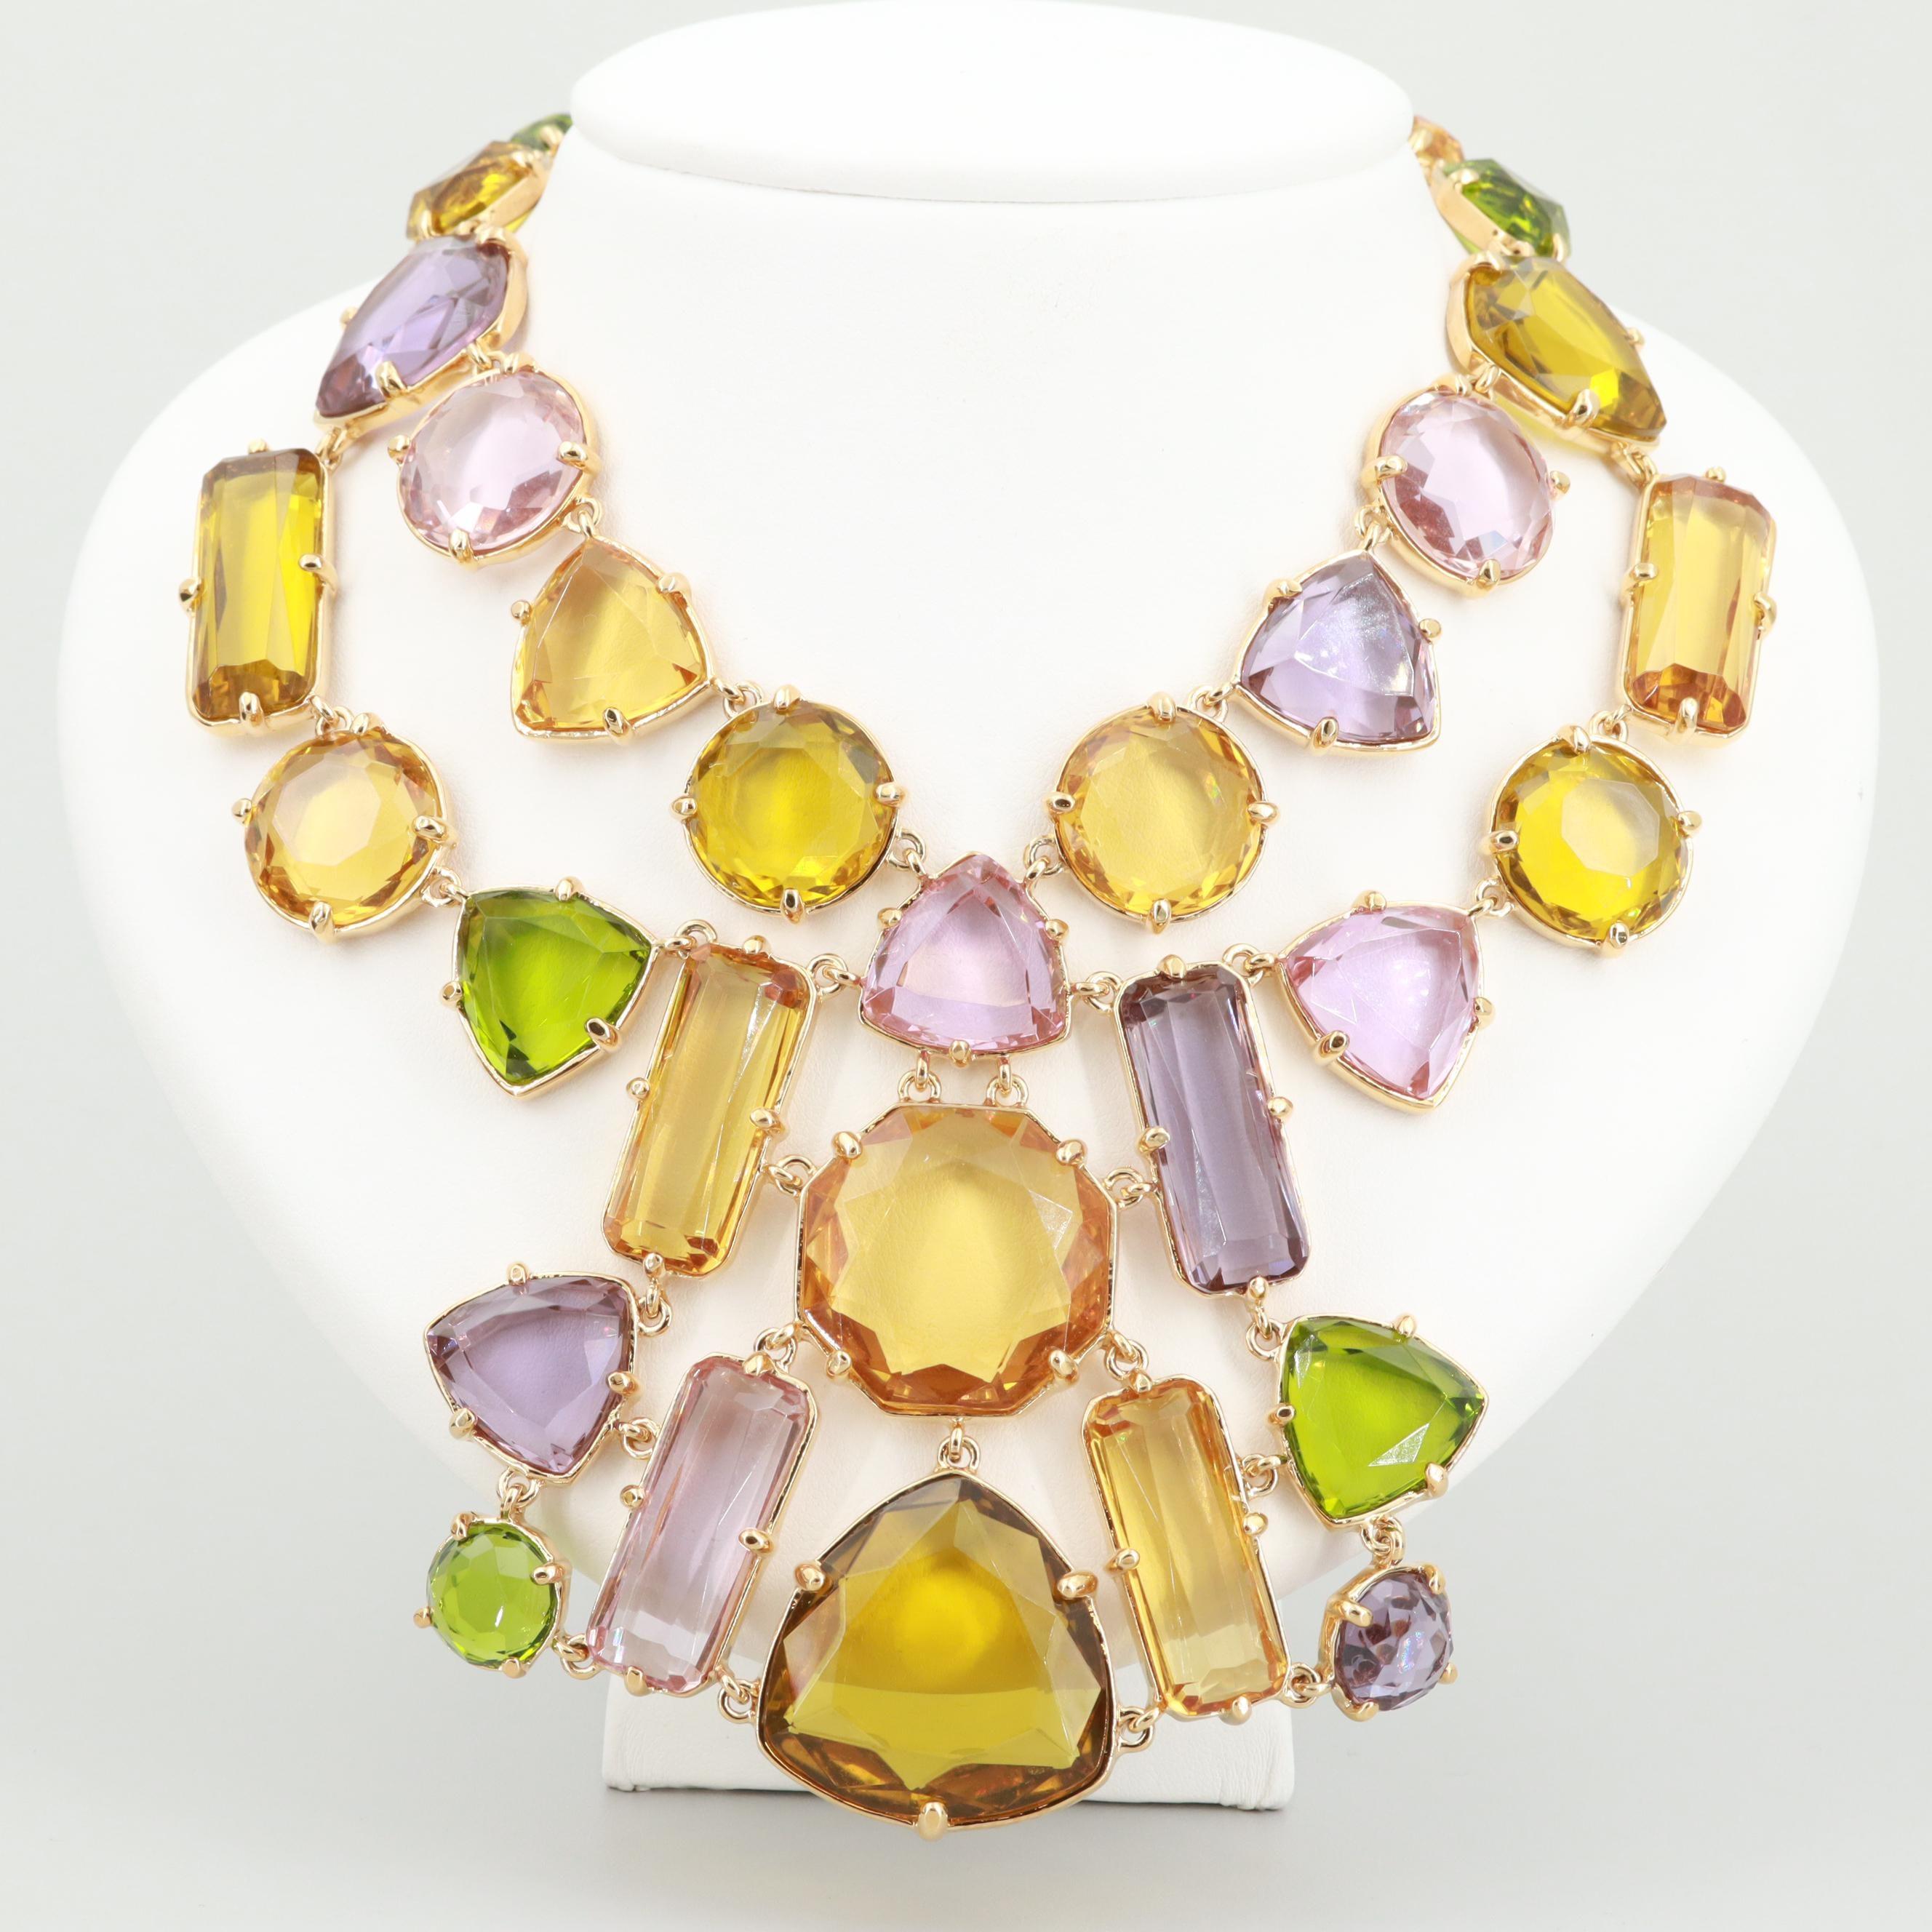 Kate Spade Gold Tone Glass Bib Necklace